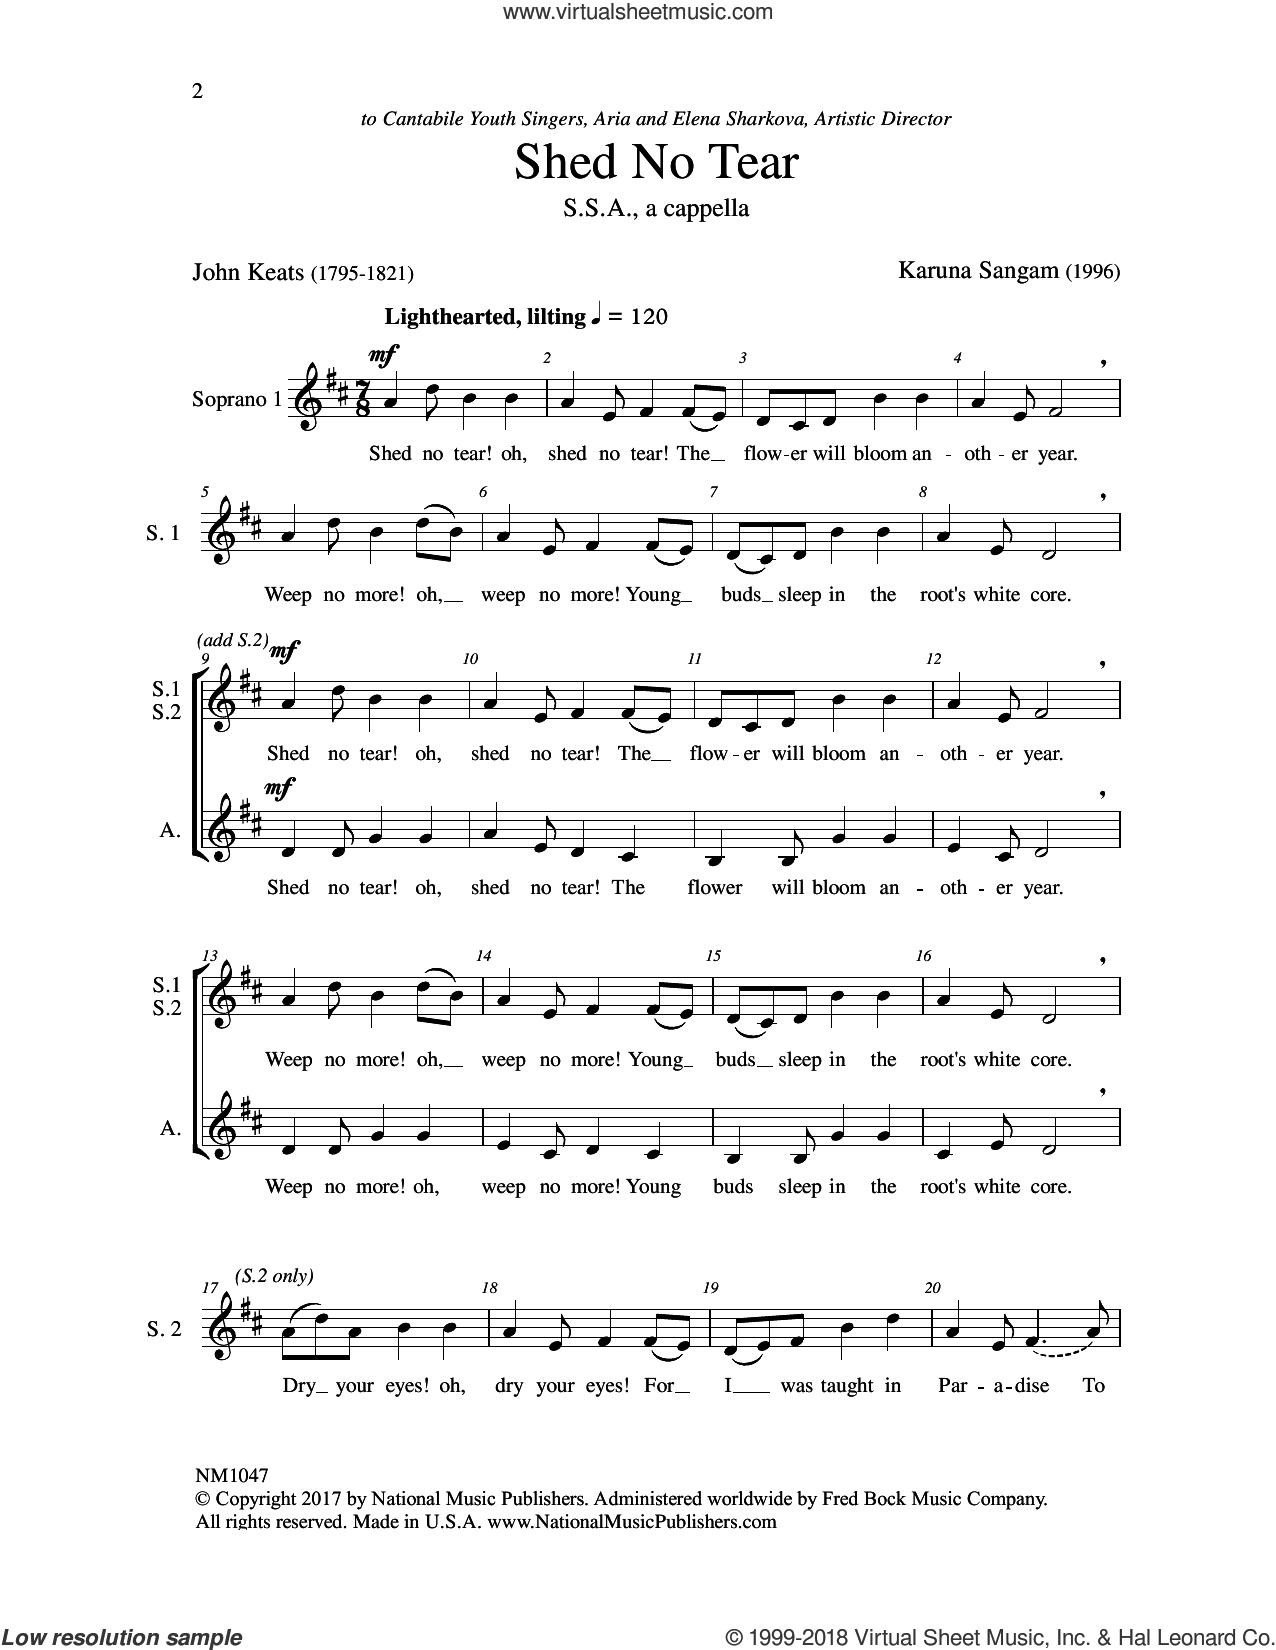 Shed No Tear sheet music for choir by John Keats and Karuna Sangam, intermediate skill level